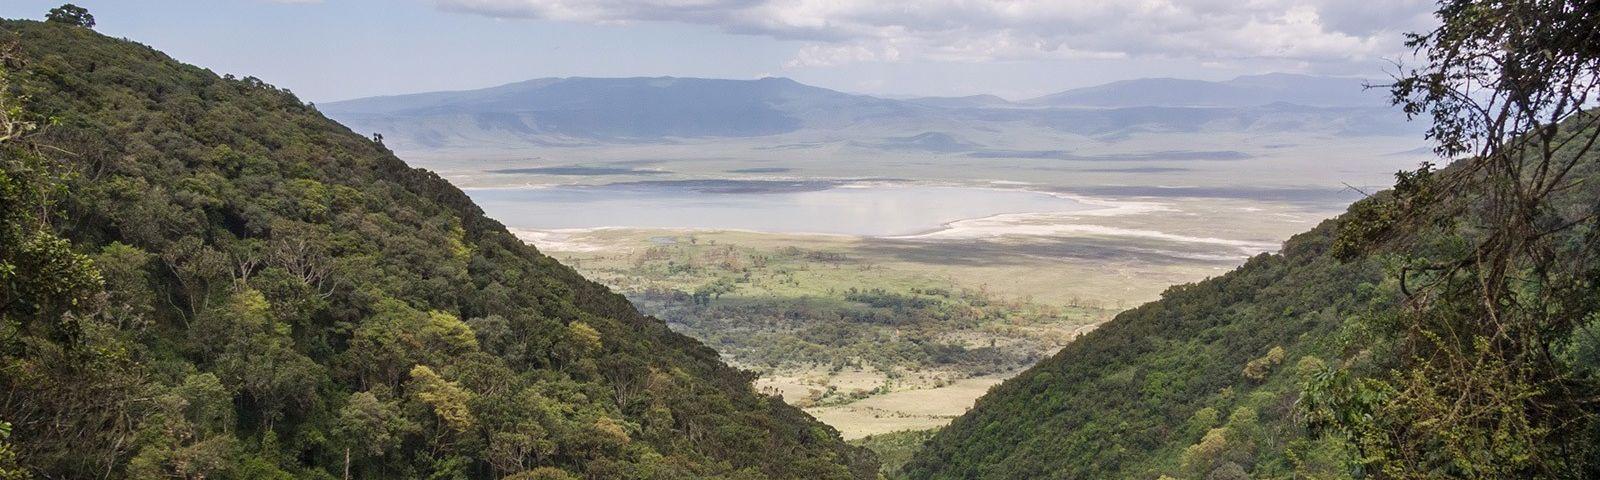 Memorable Bike Race In The Rift Valley! Ngorongoro und Great Rift Valley